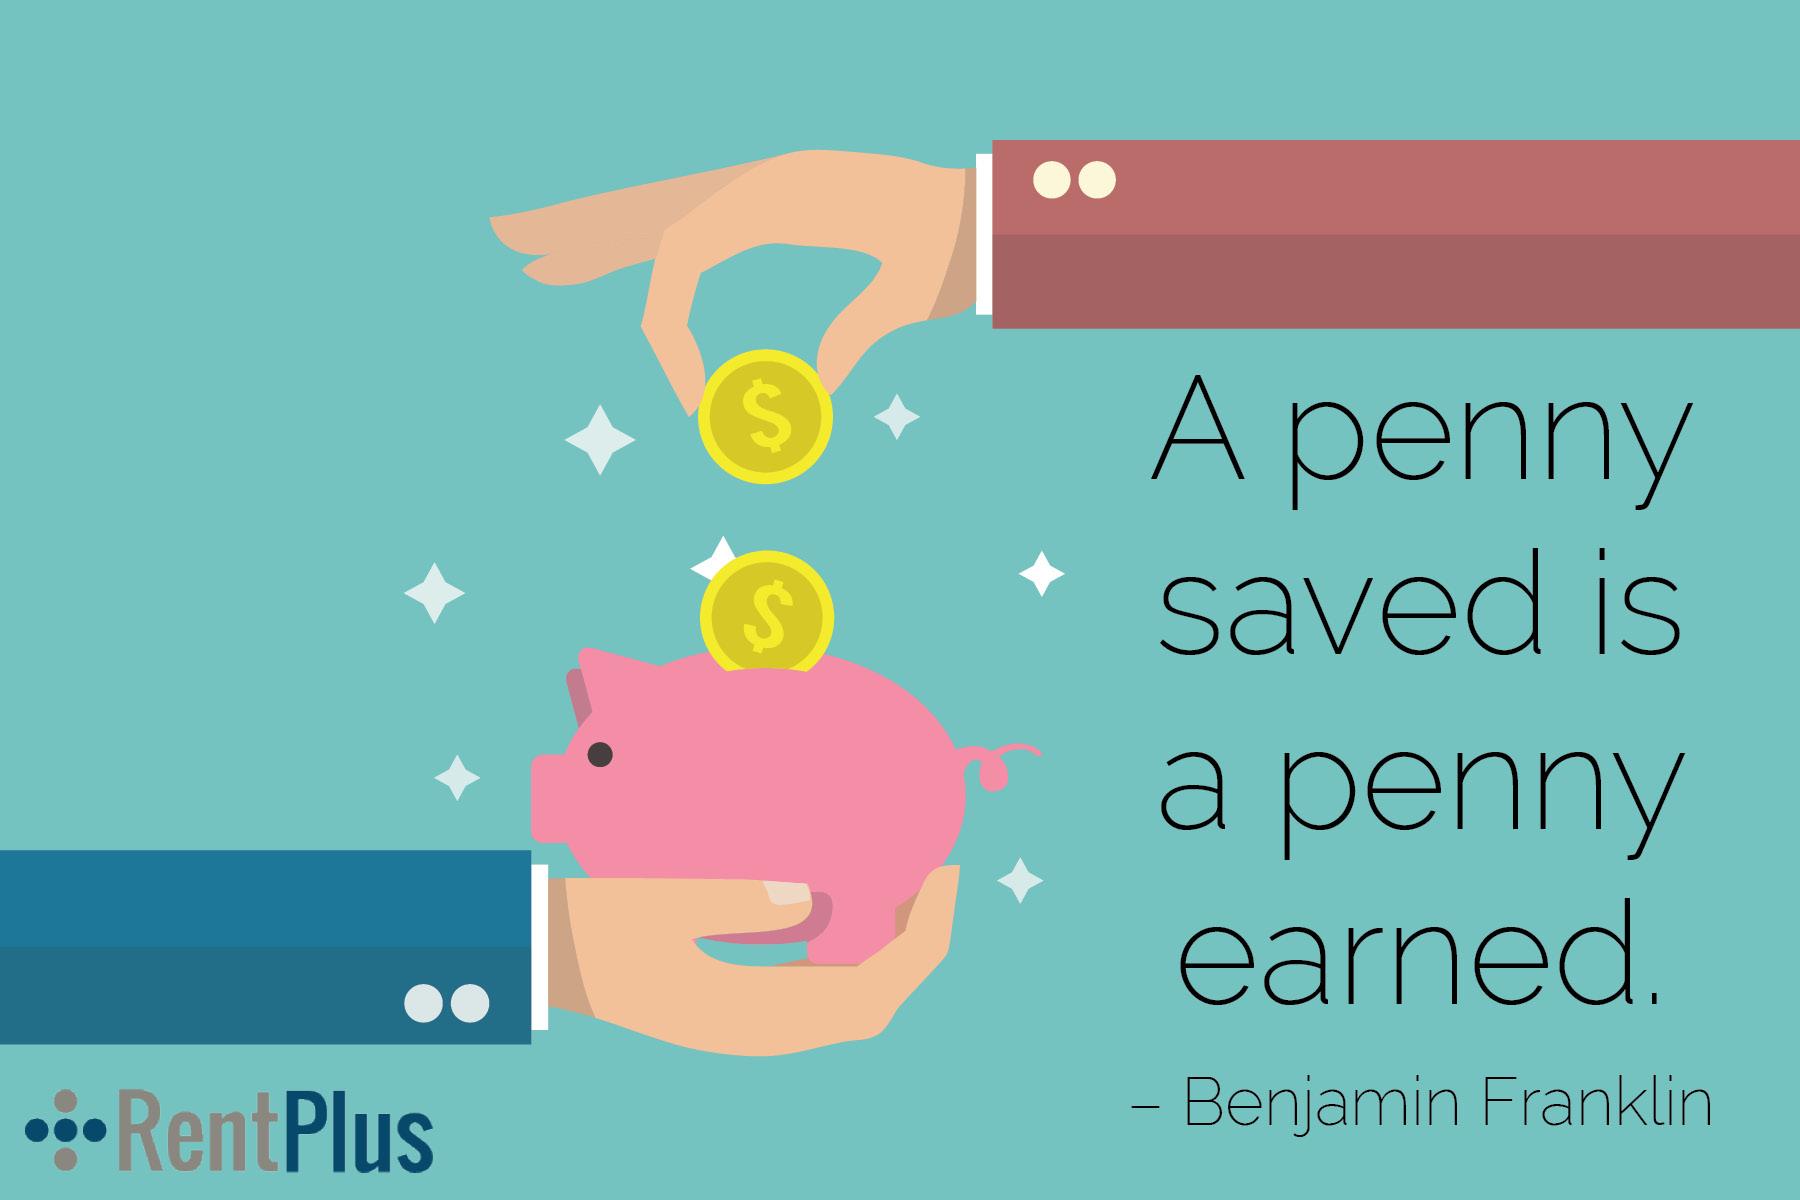 RentPlus – Penny Saved.jpg